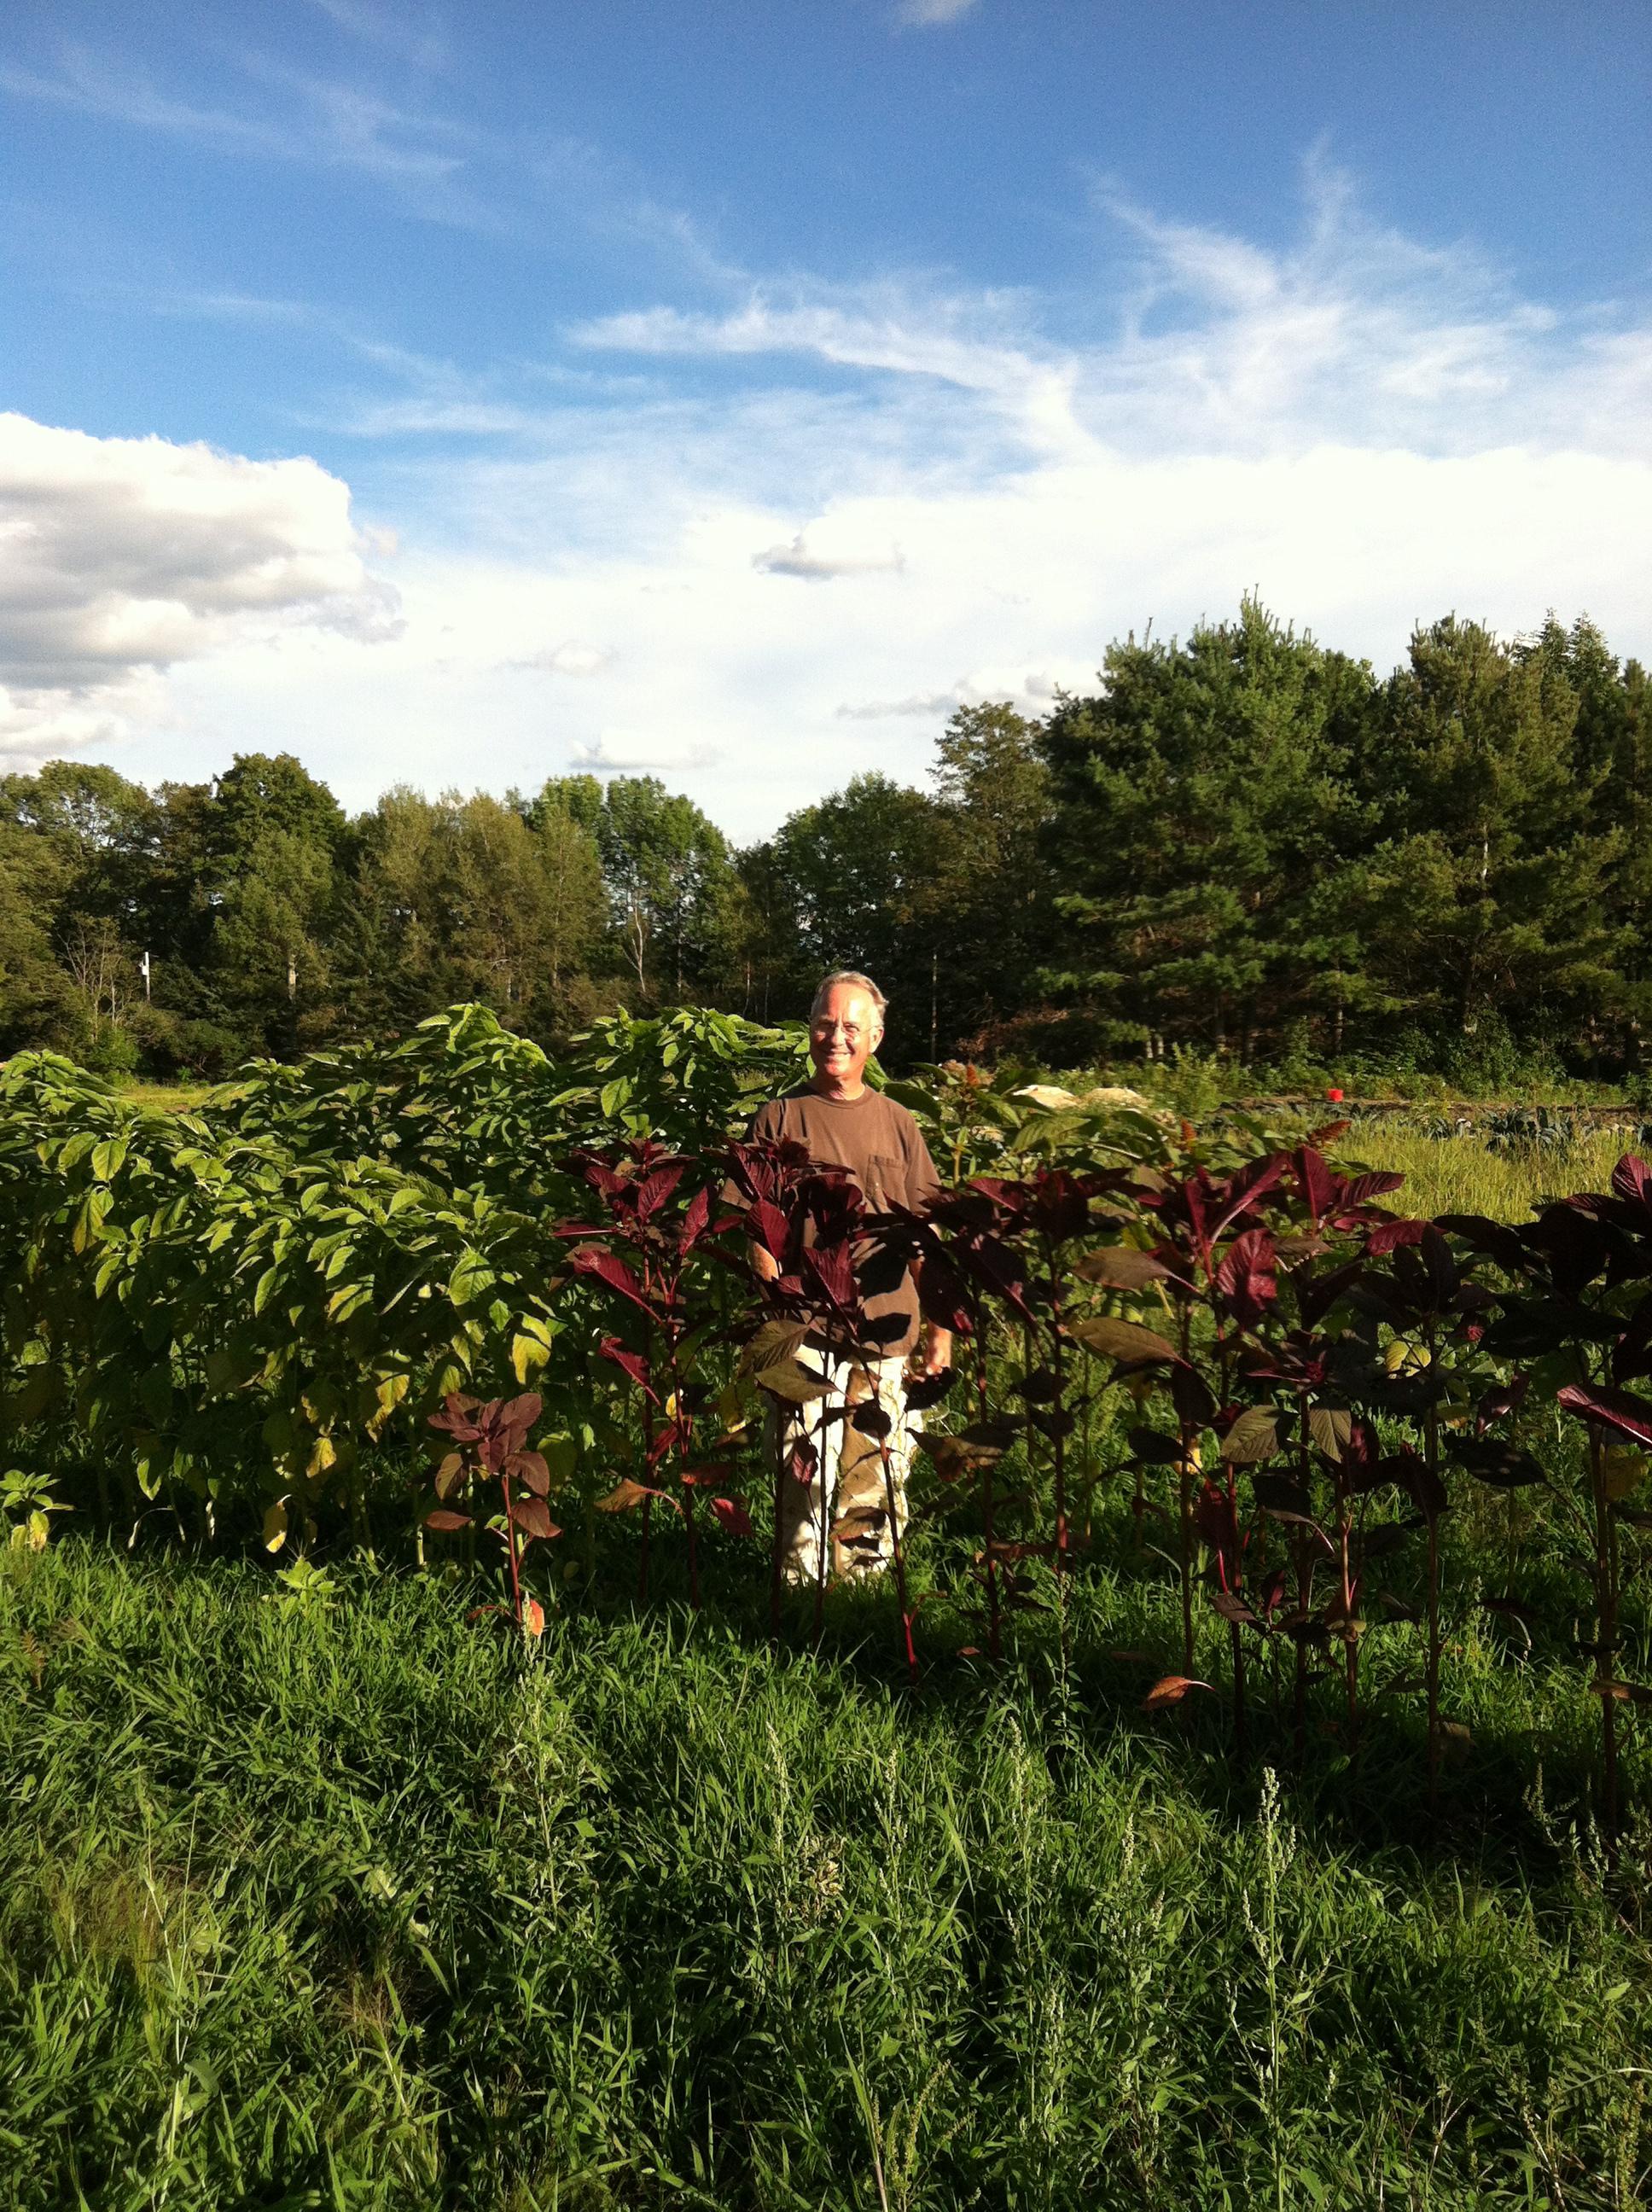 Summer 2012.  Green and burgundy amaranth.